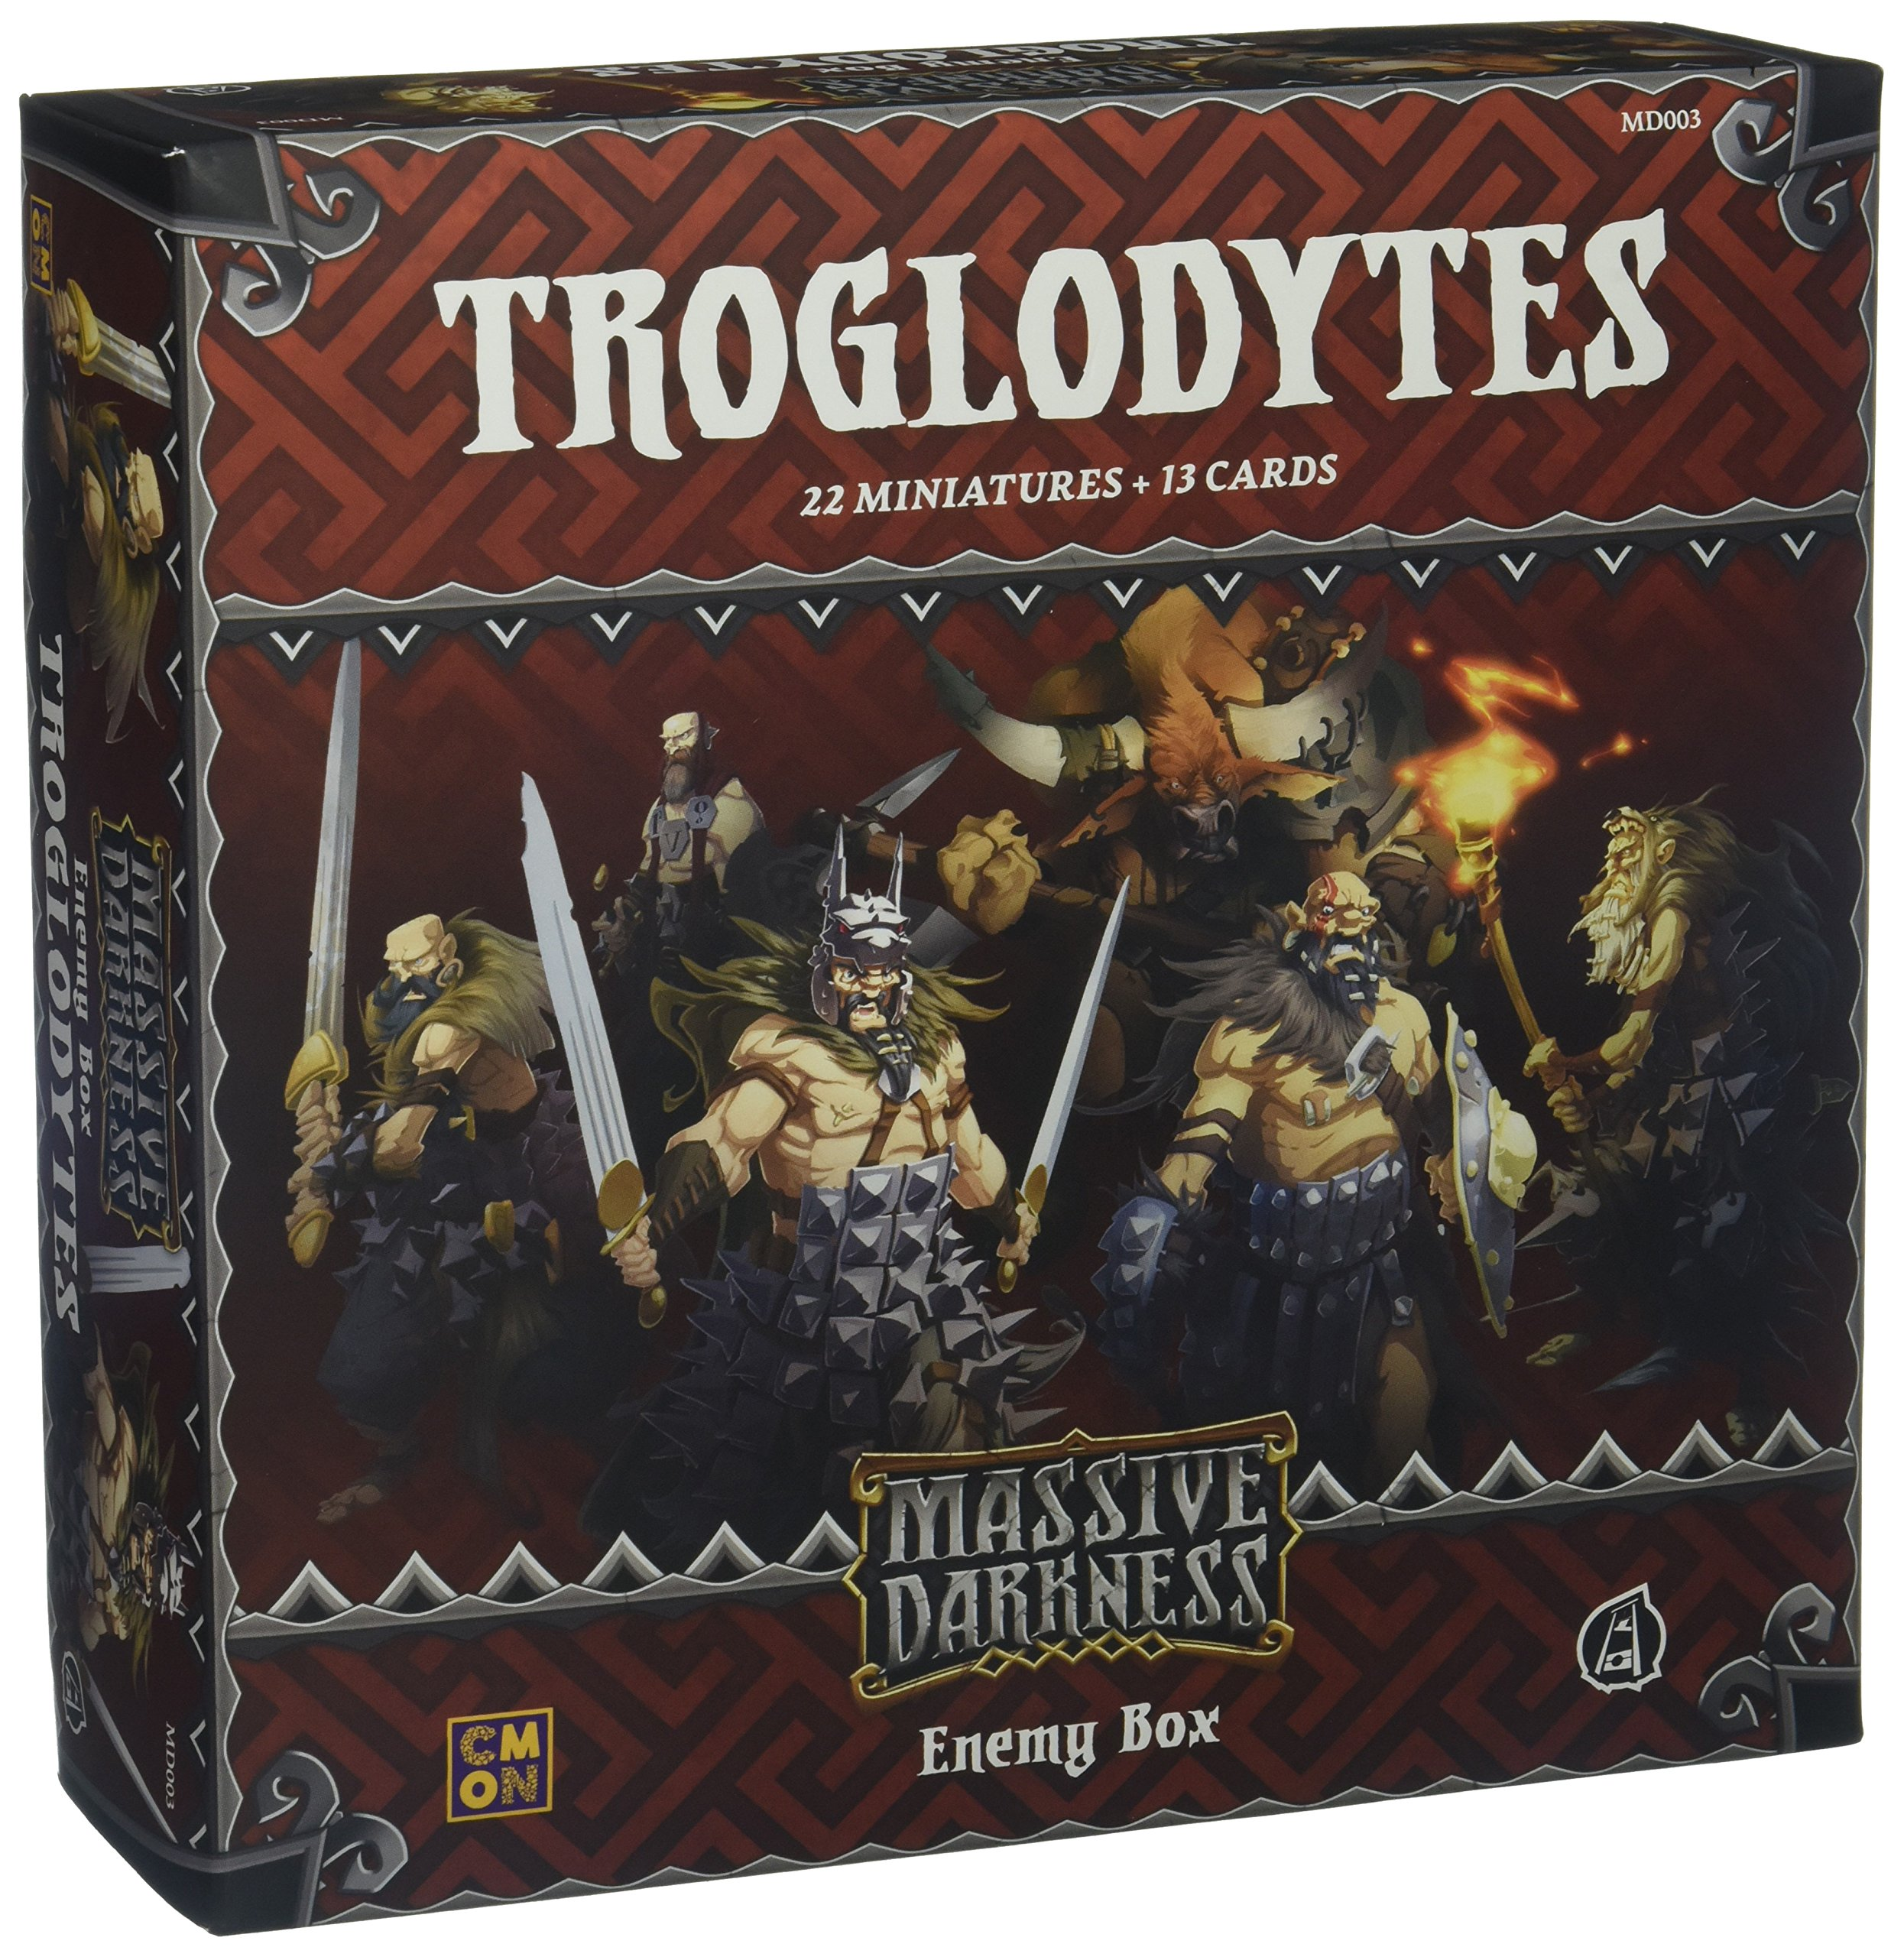 CMON MD003 Massive Darkness: Enemy Box: Troglodytes Board Games